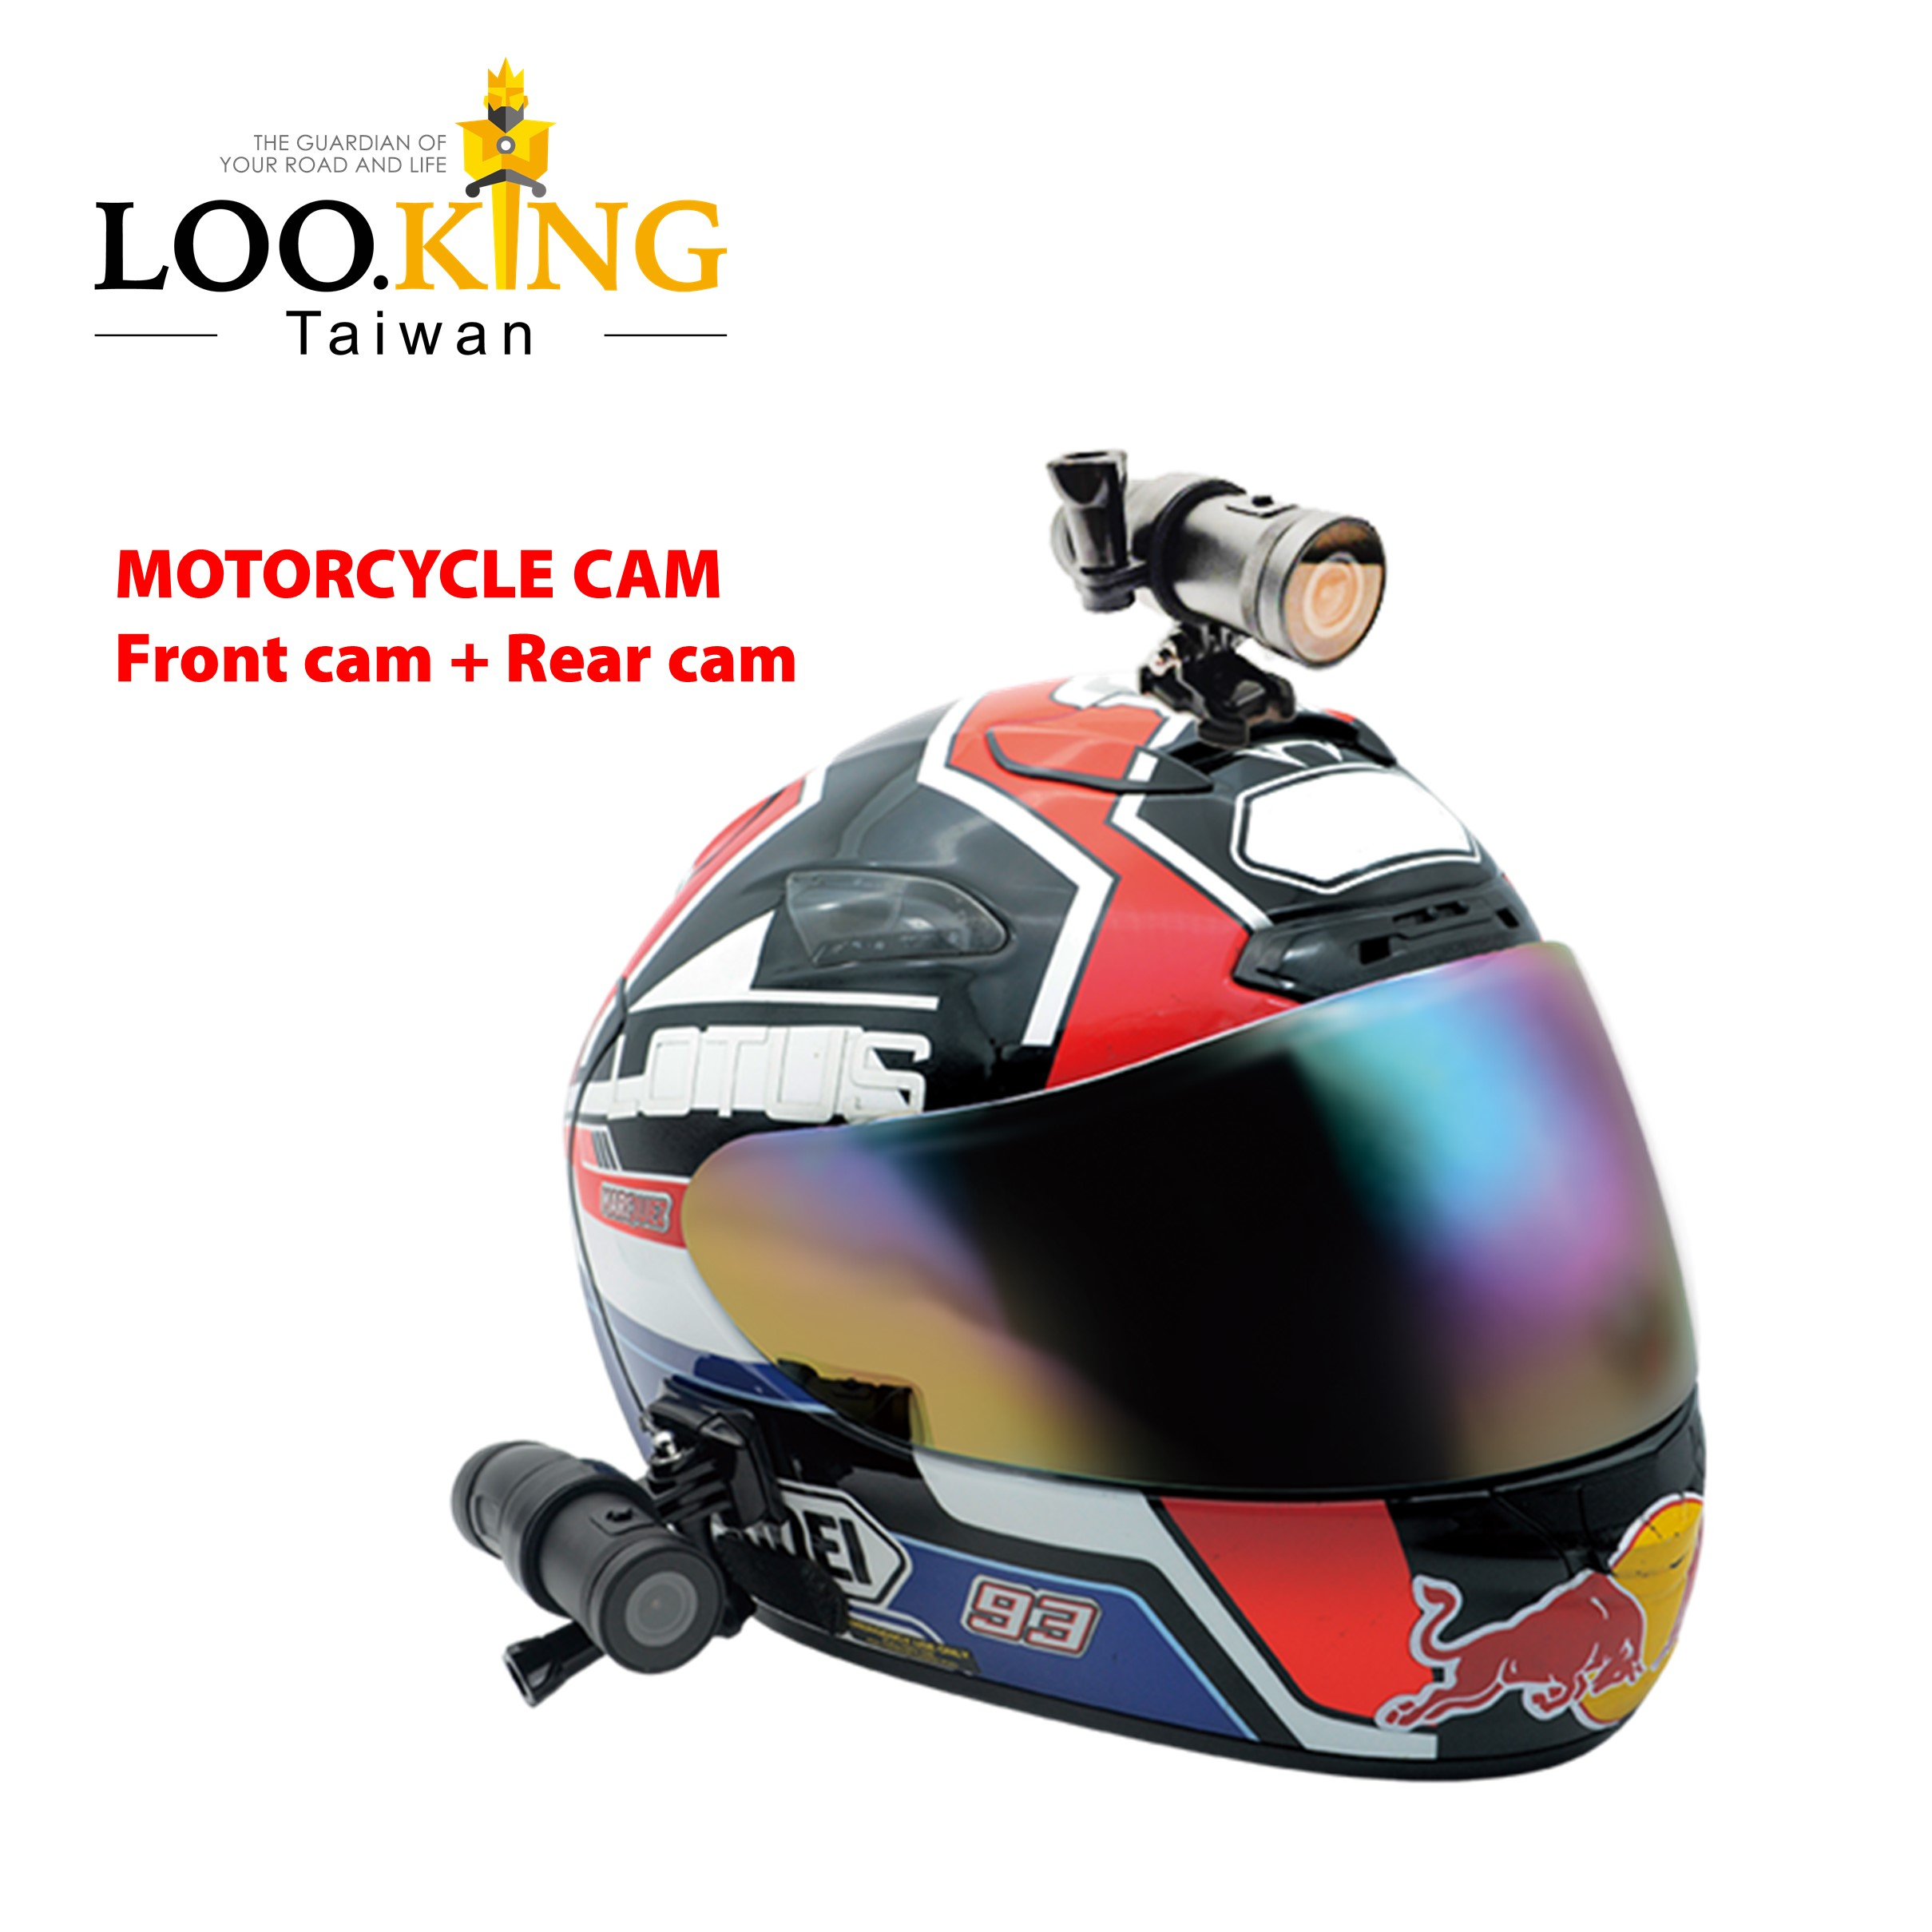 Taiwán diseño de patente cámara frontal y trasera IMX 307 de la motocicleta del casco de la cámara - ANKUX Tech Co., Ltd